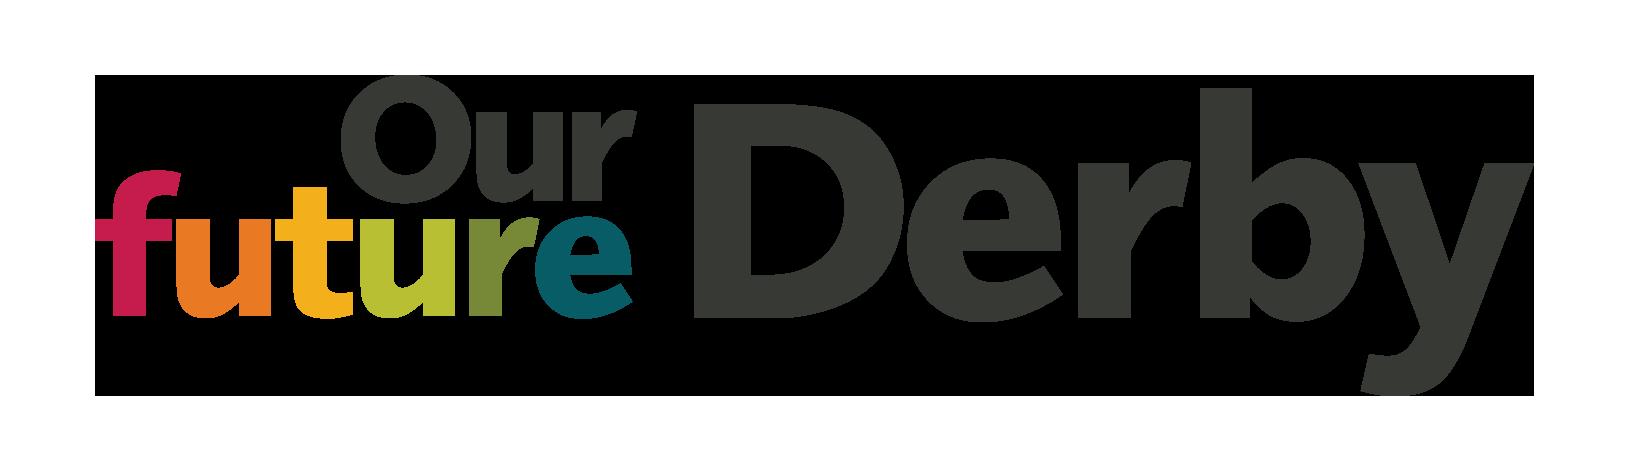 Our Future-Derby - DMH Associates